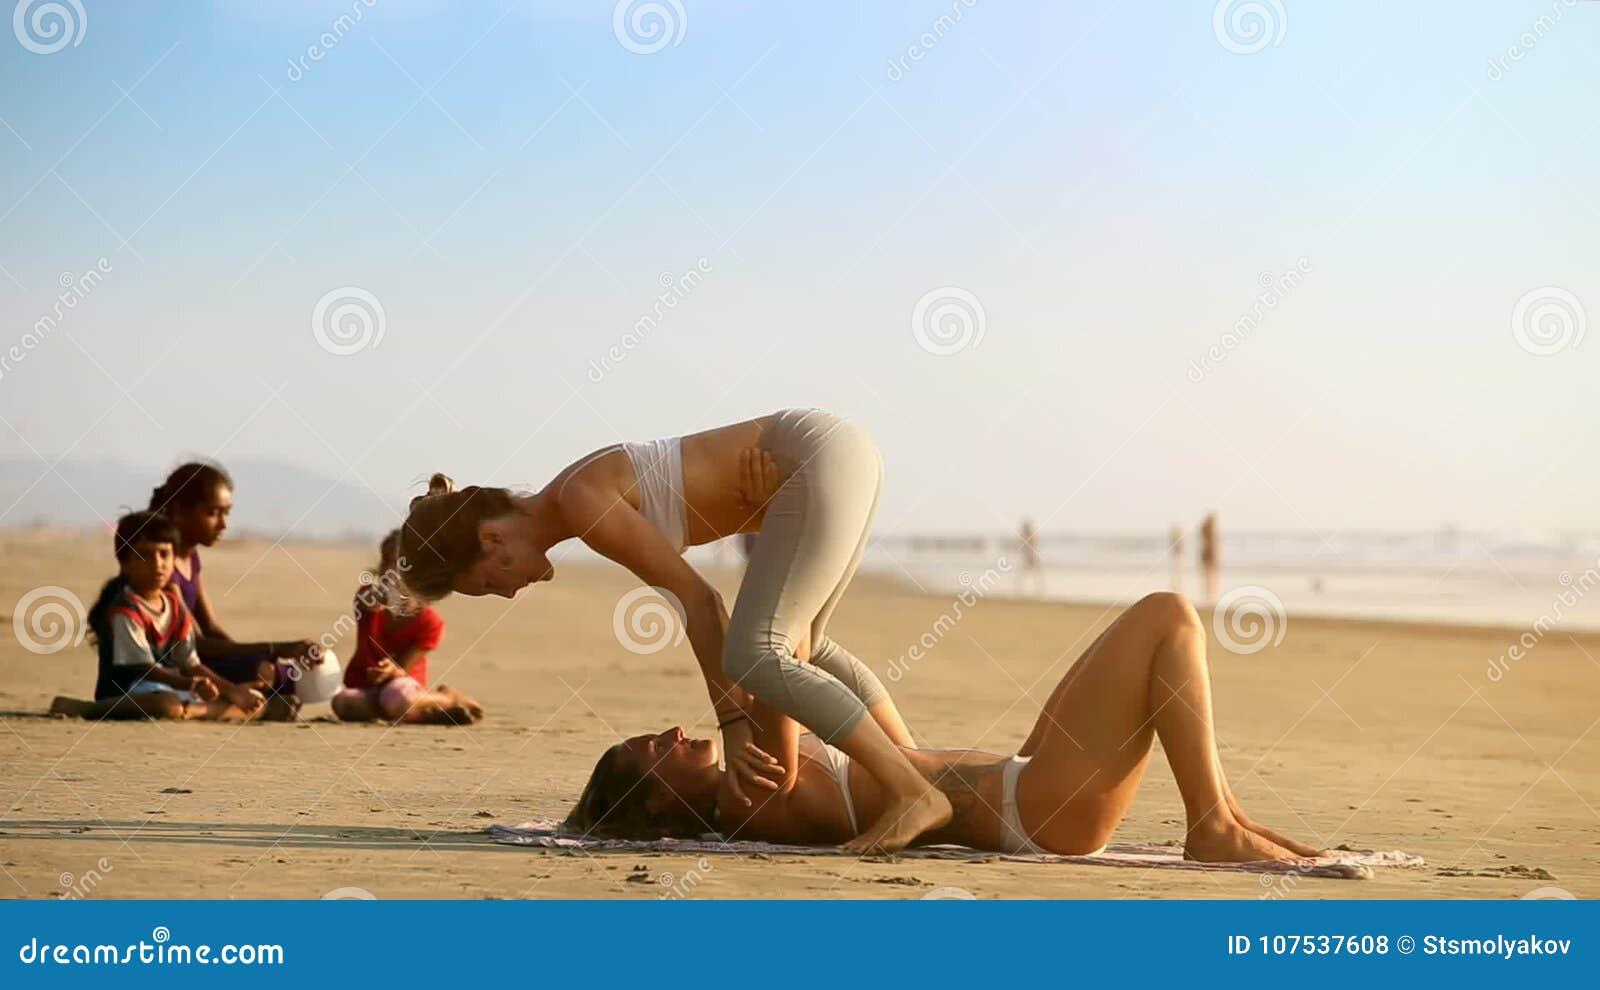 Bulgarian woman dating